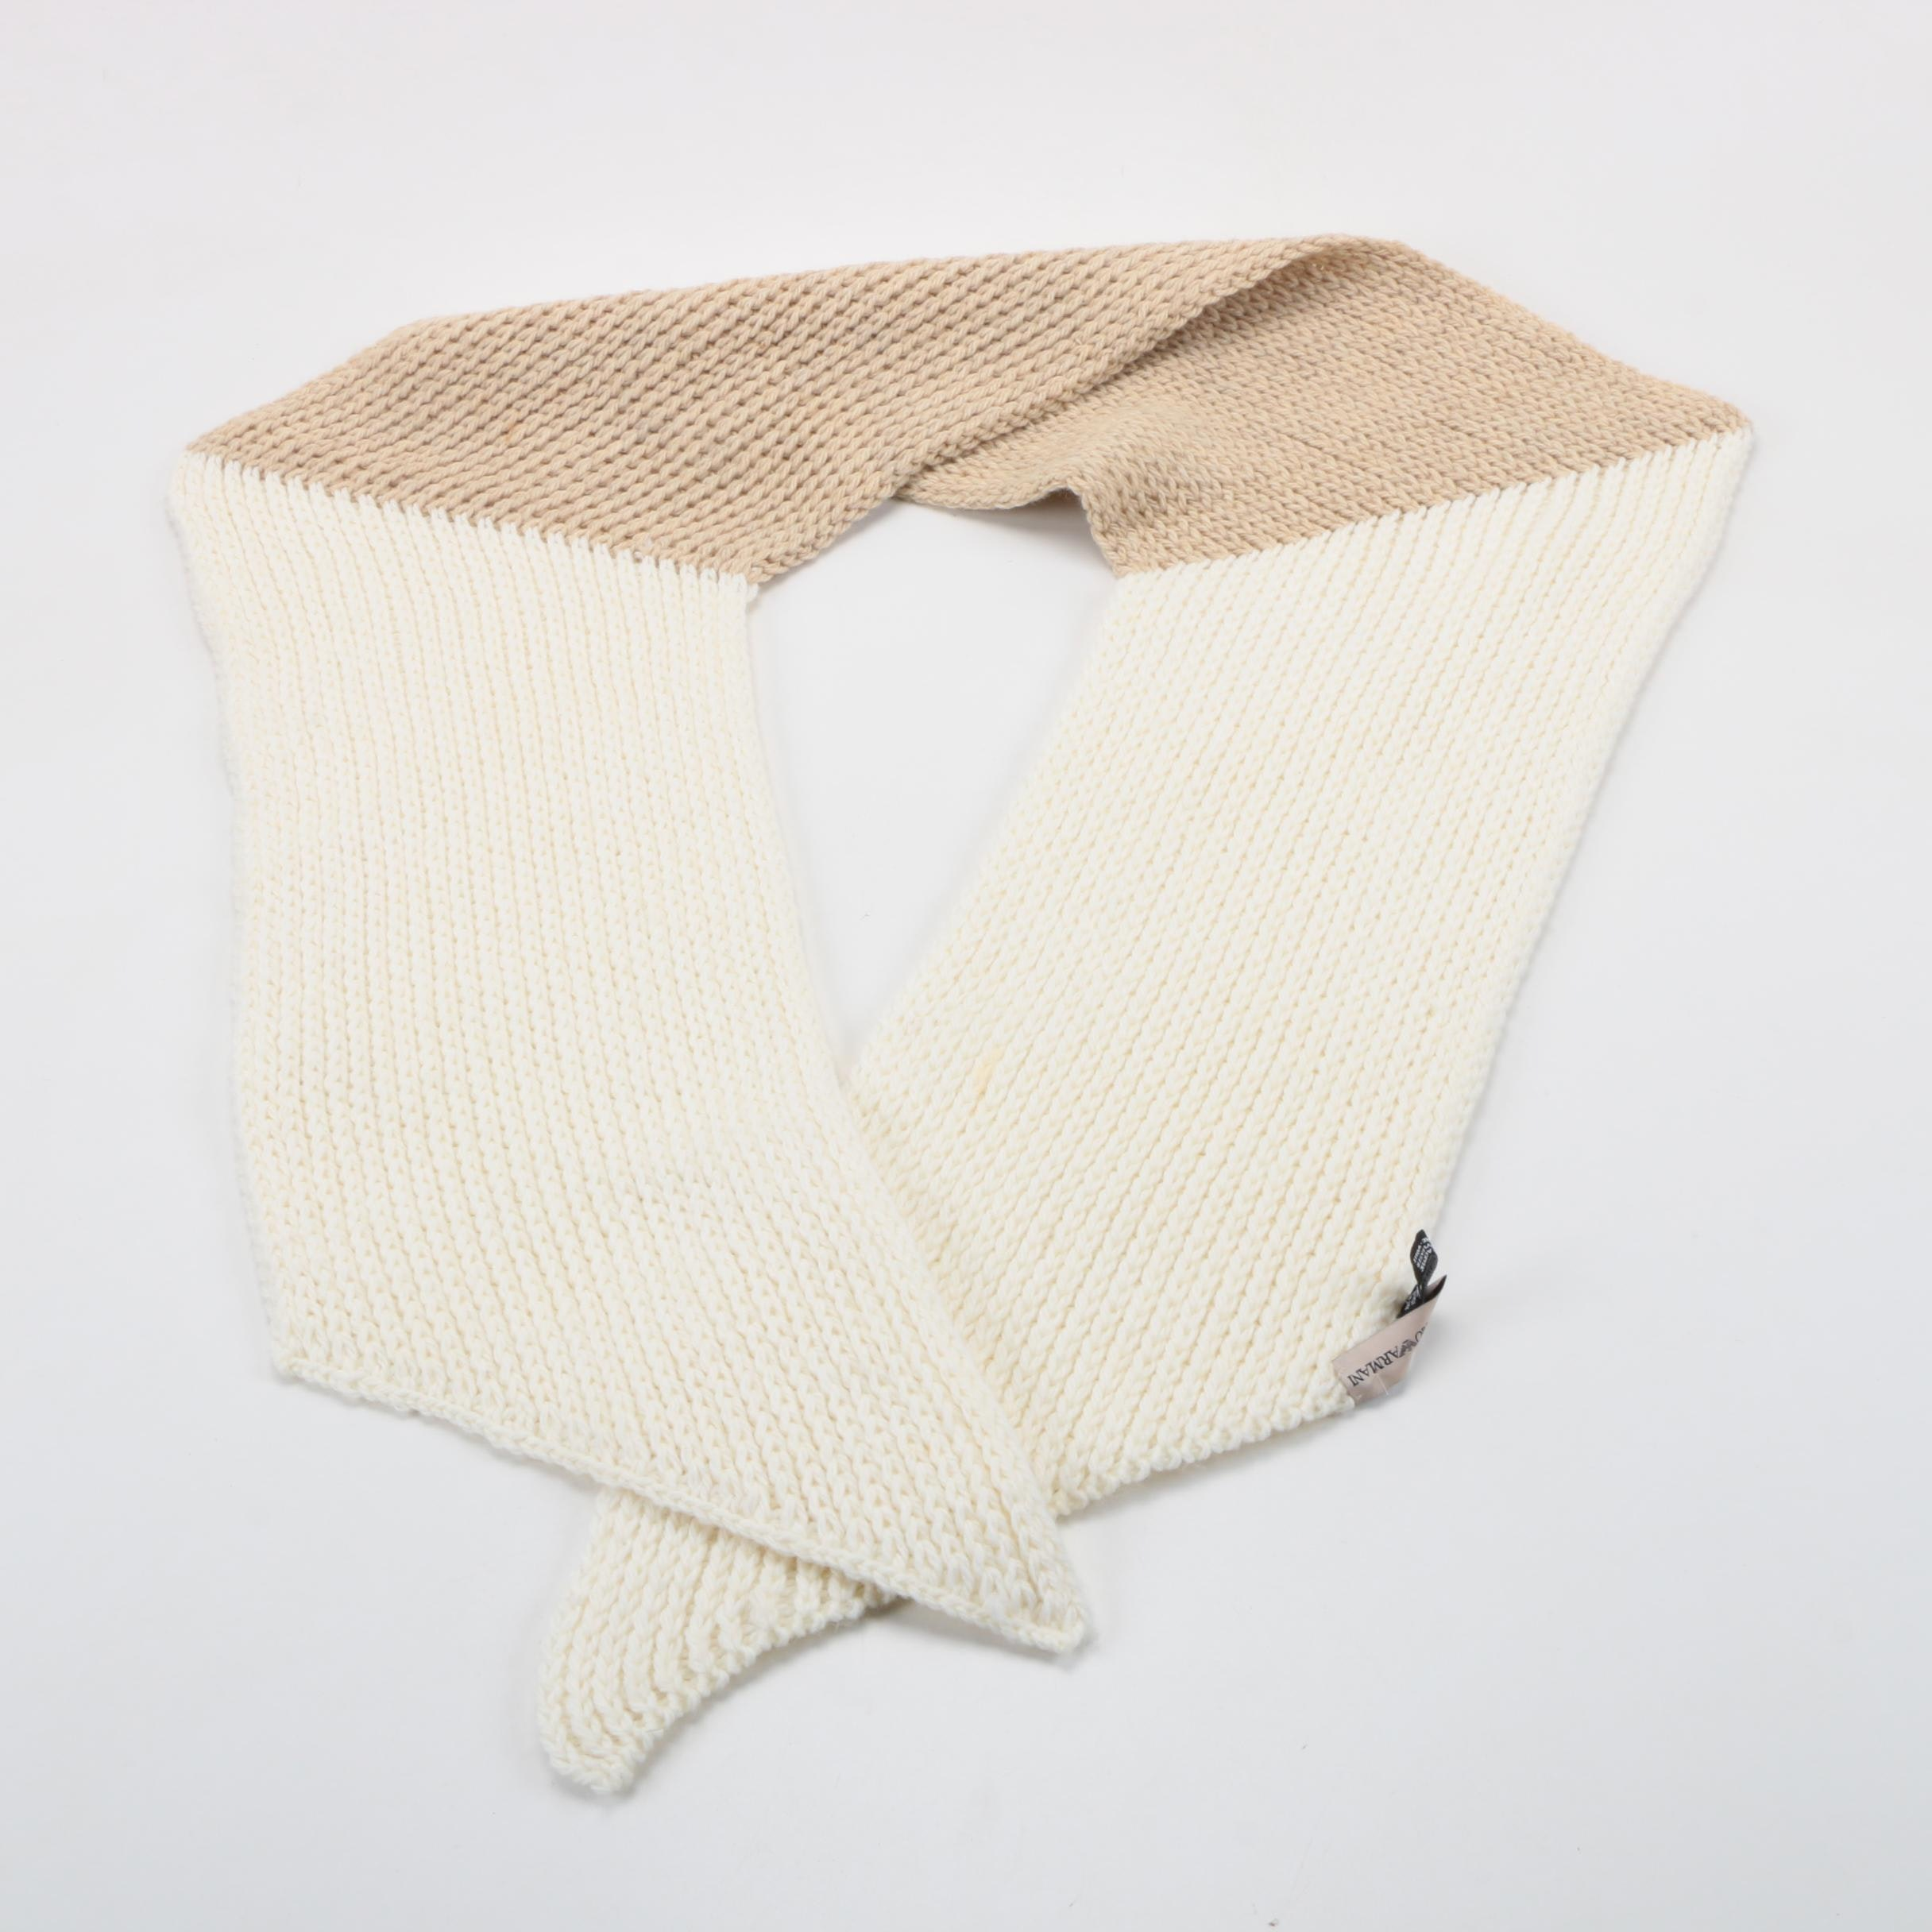 Emporio Armani Knit Scarf